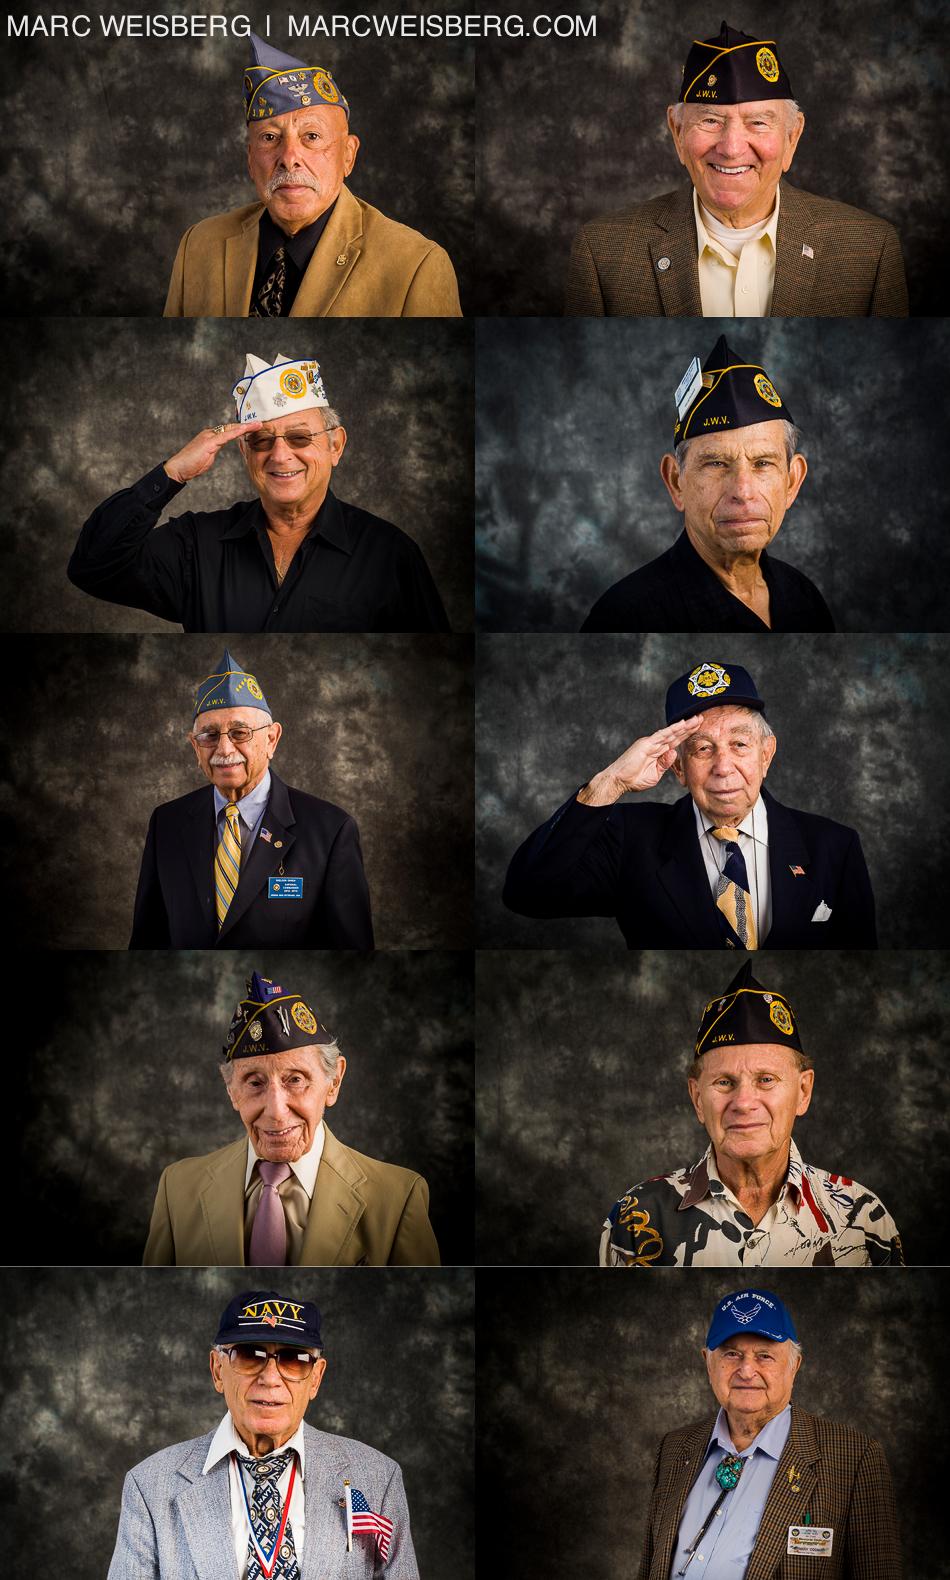 studio photographs of jewish world war II veternas